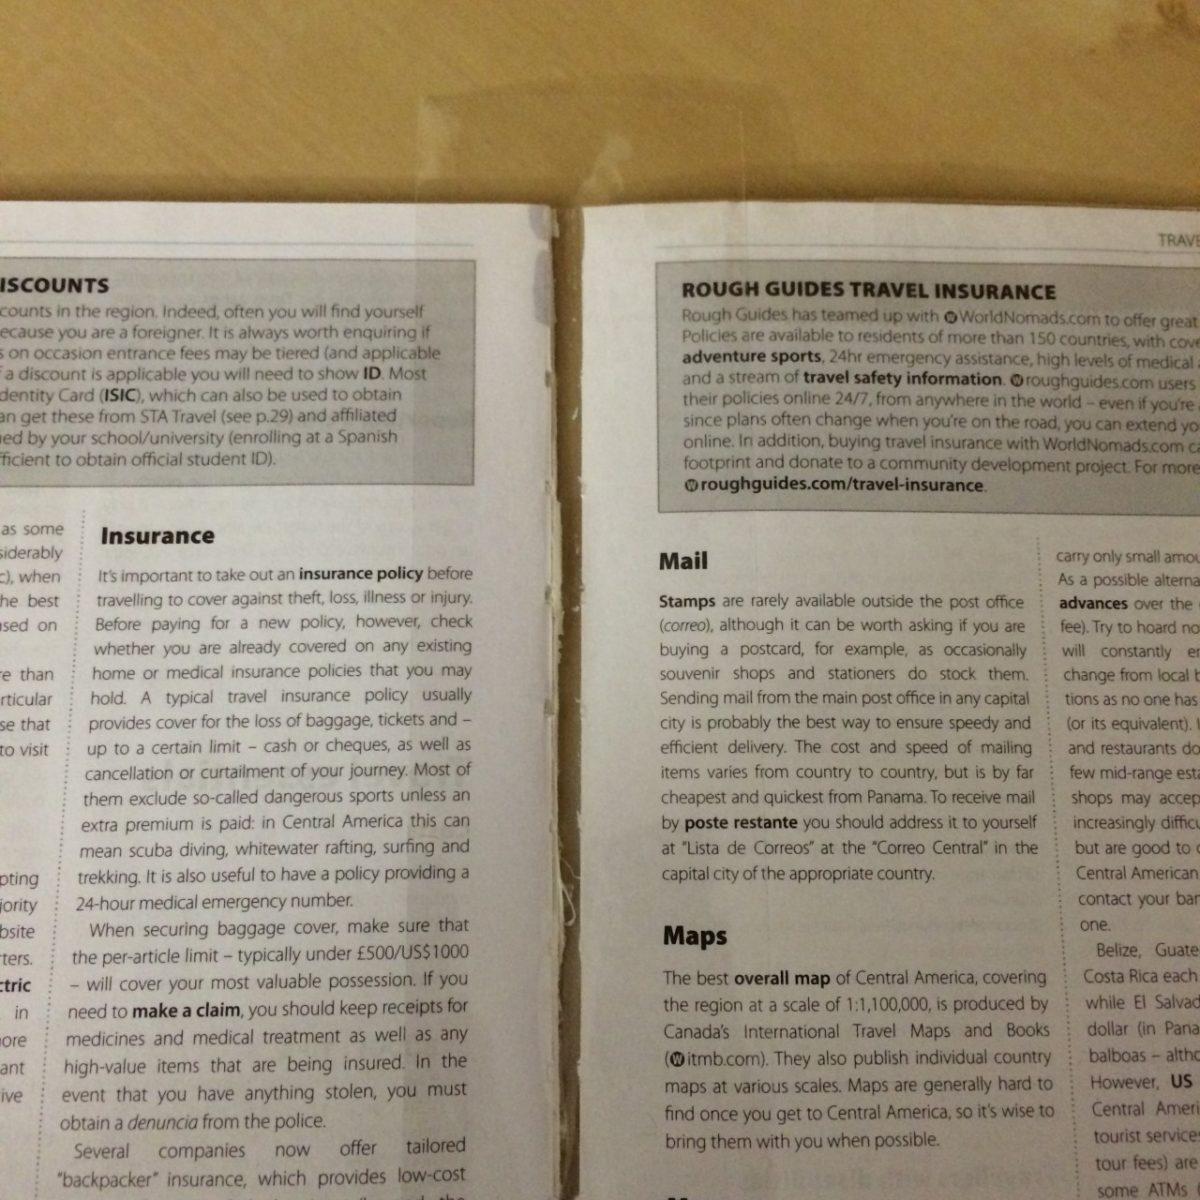 Guidebook inner spine taping